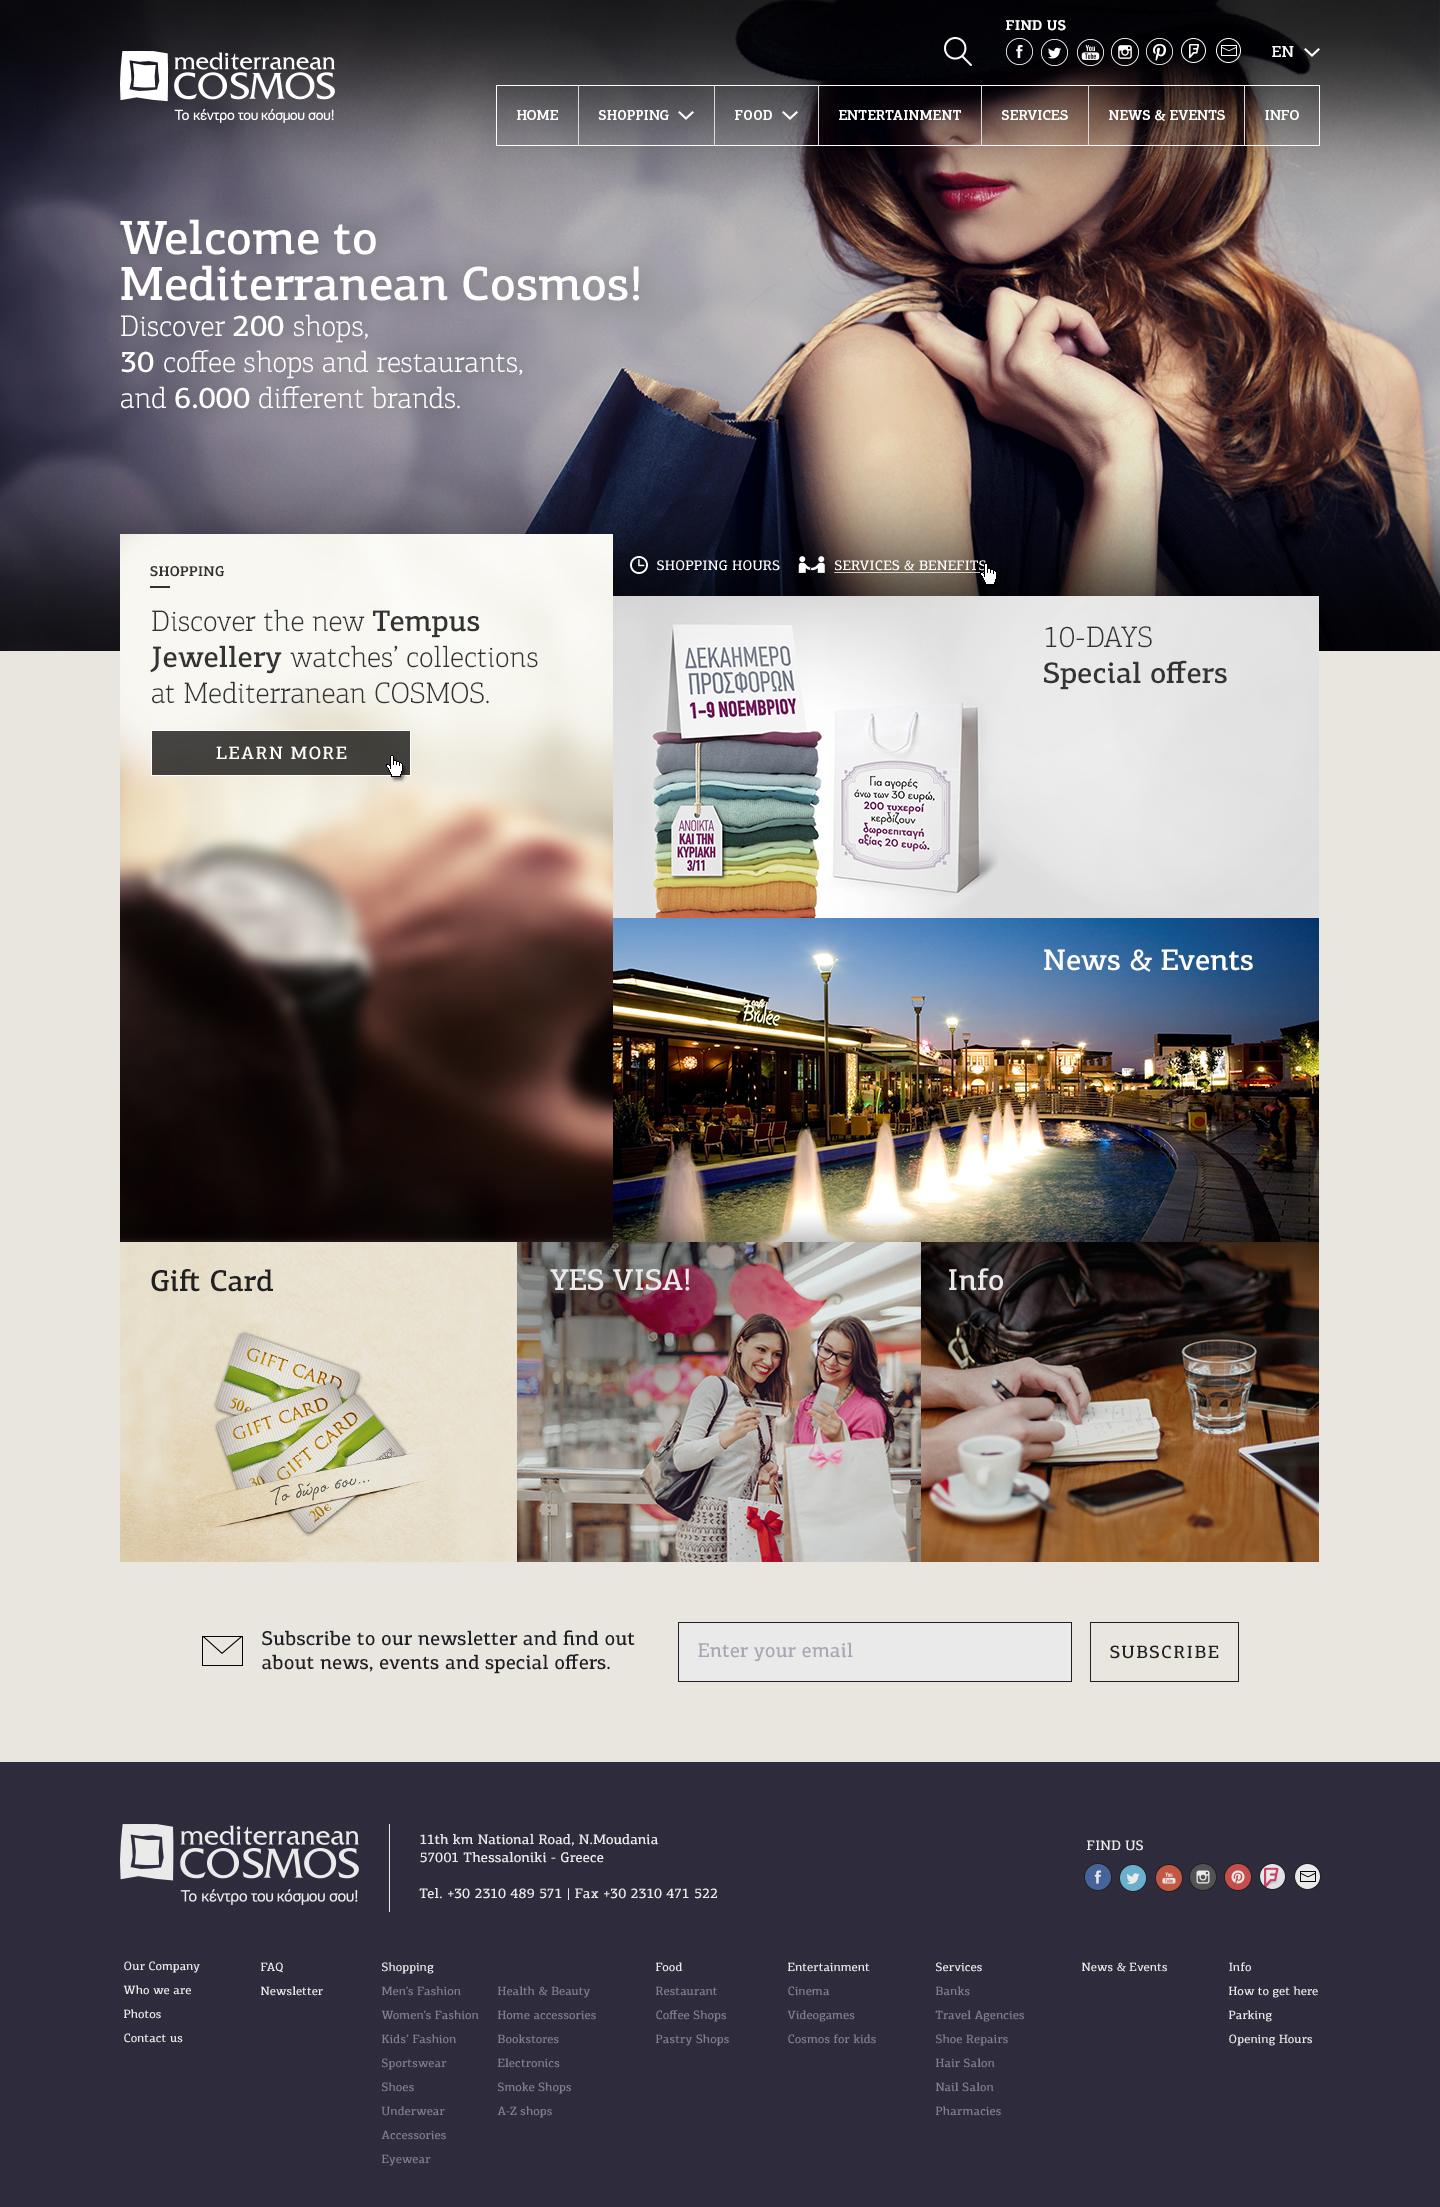 Med Cosmos Homepage V2